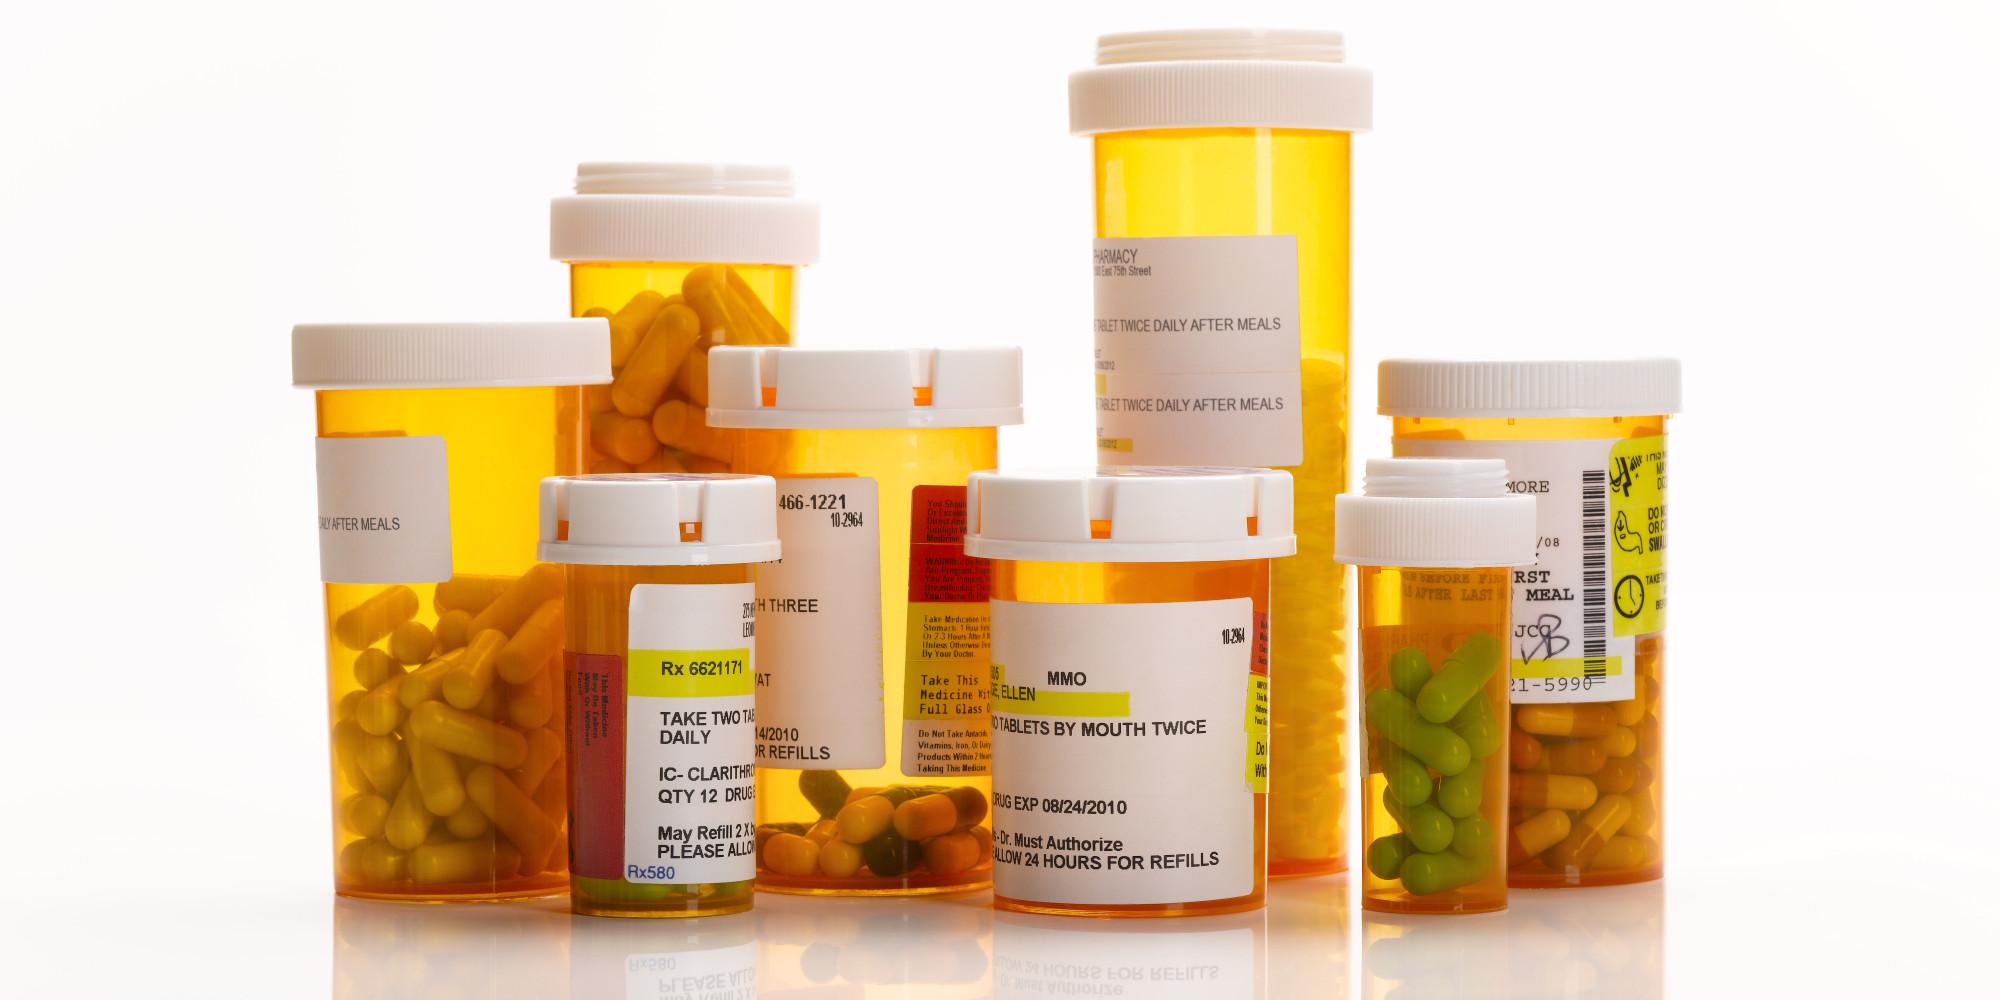 o-PRESCRIPTION-DRUGS-facebook.jpg